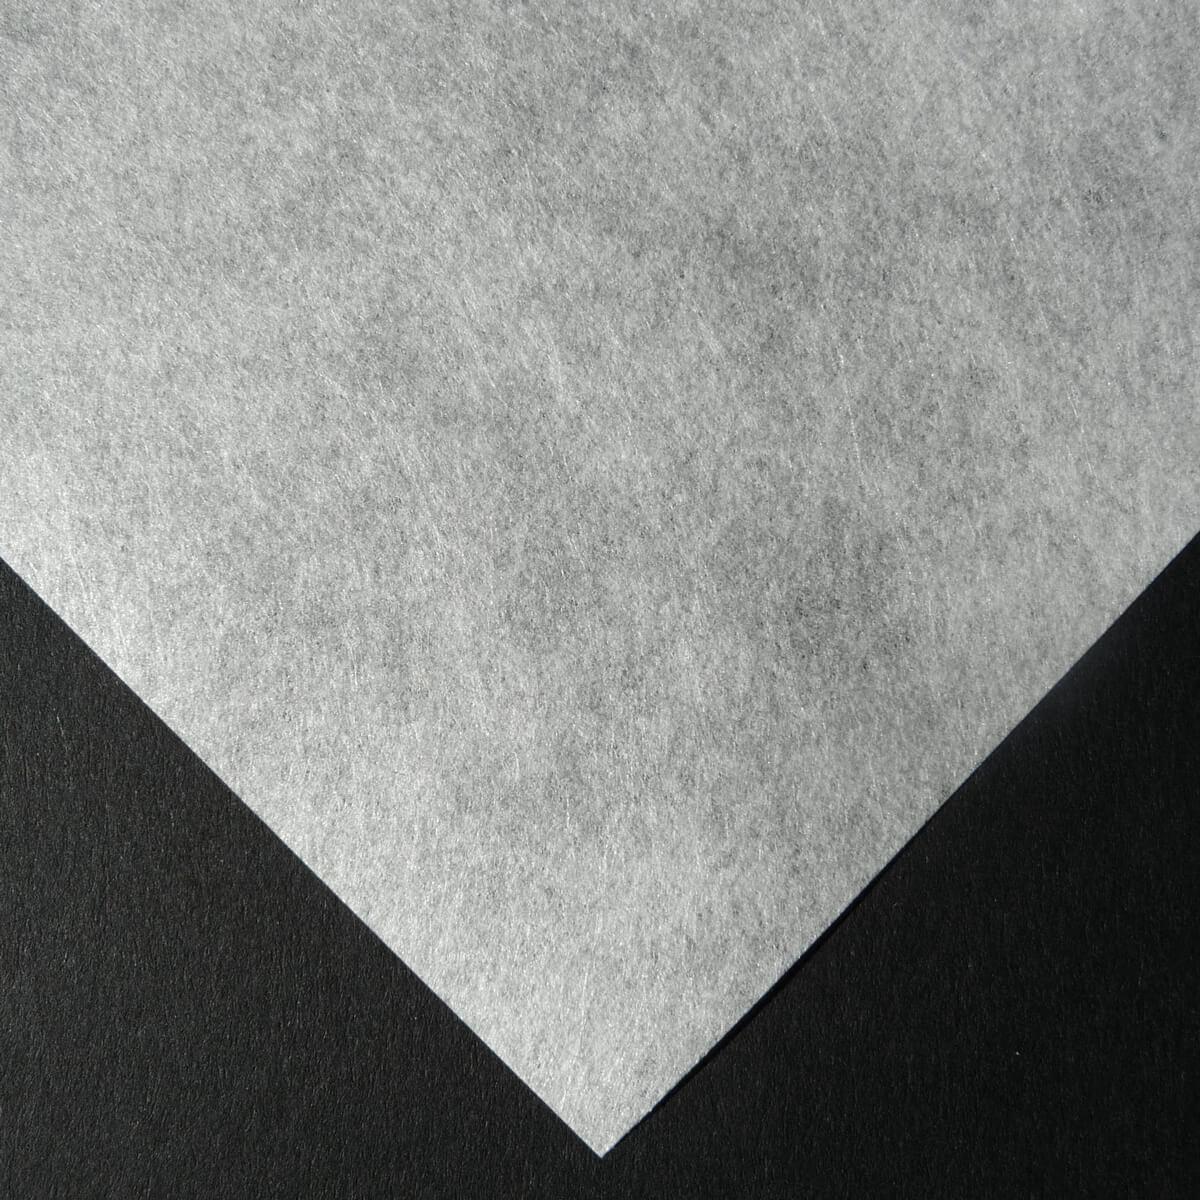 Sympatex 100 Polyester Membrane Laminate Talas